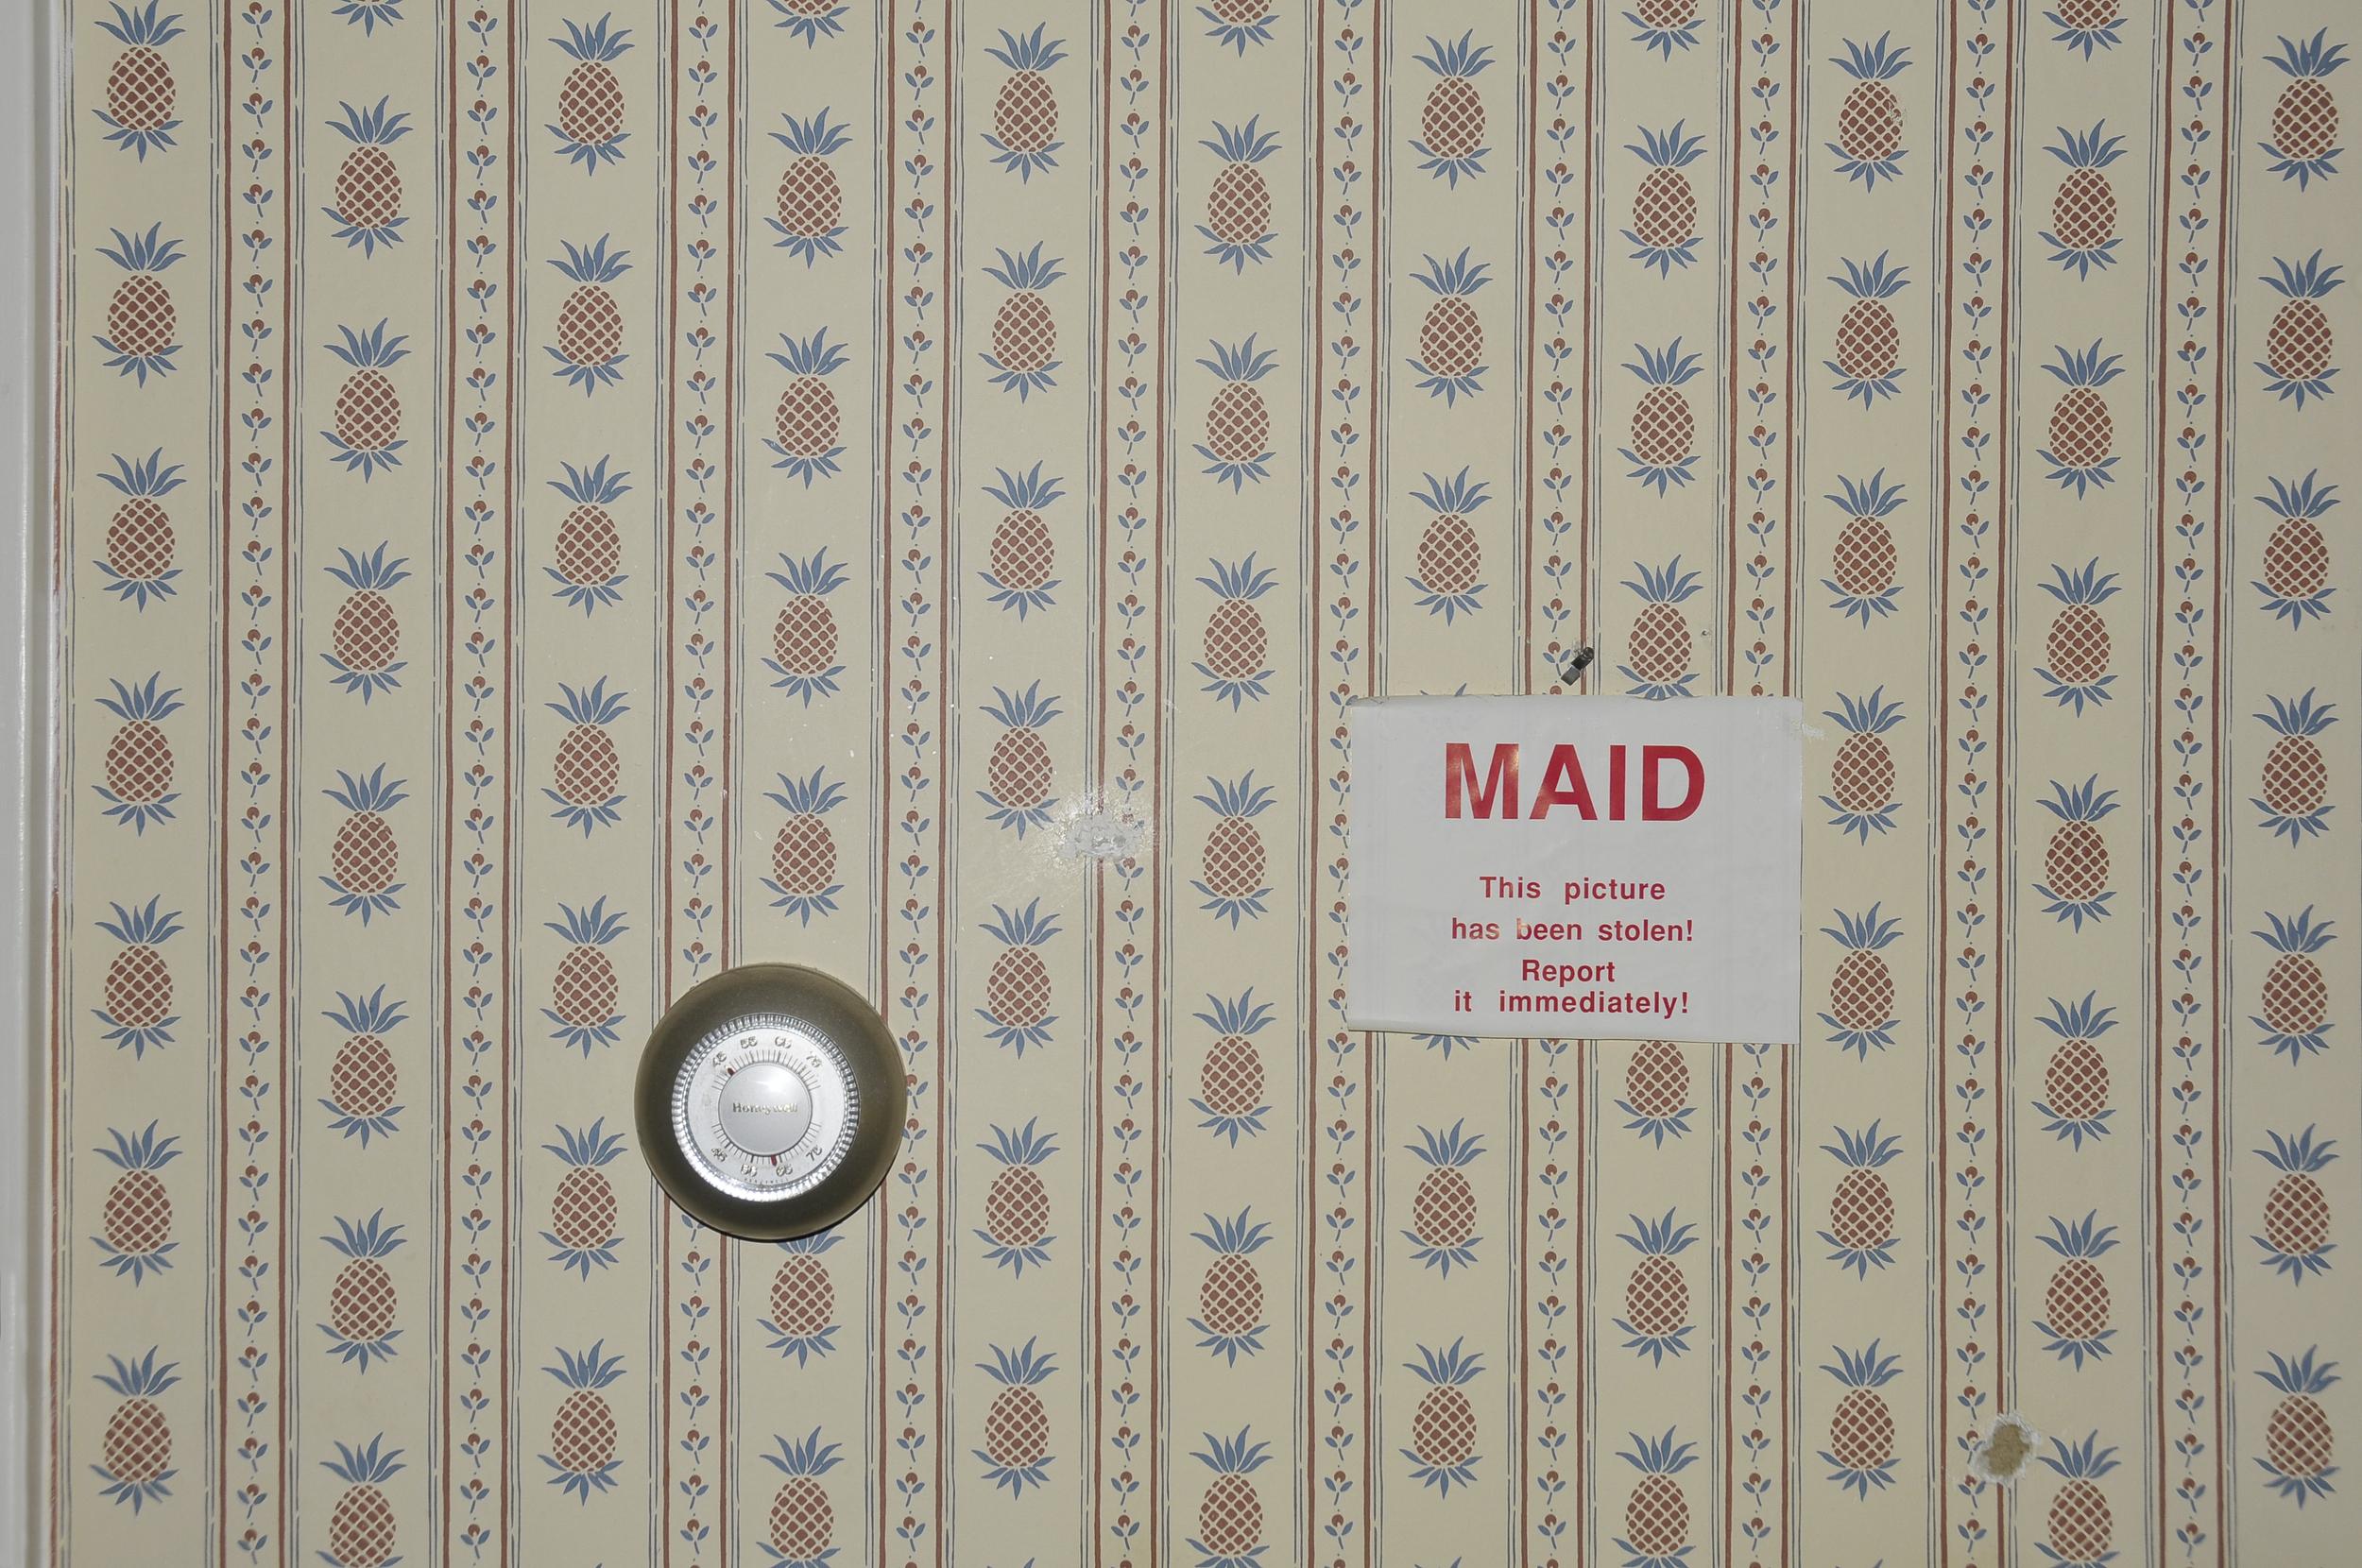 MAID 92812.jpg